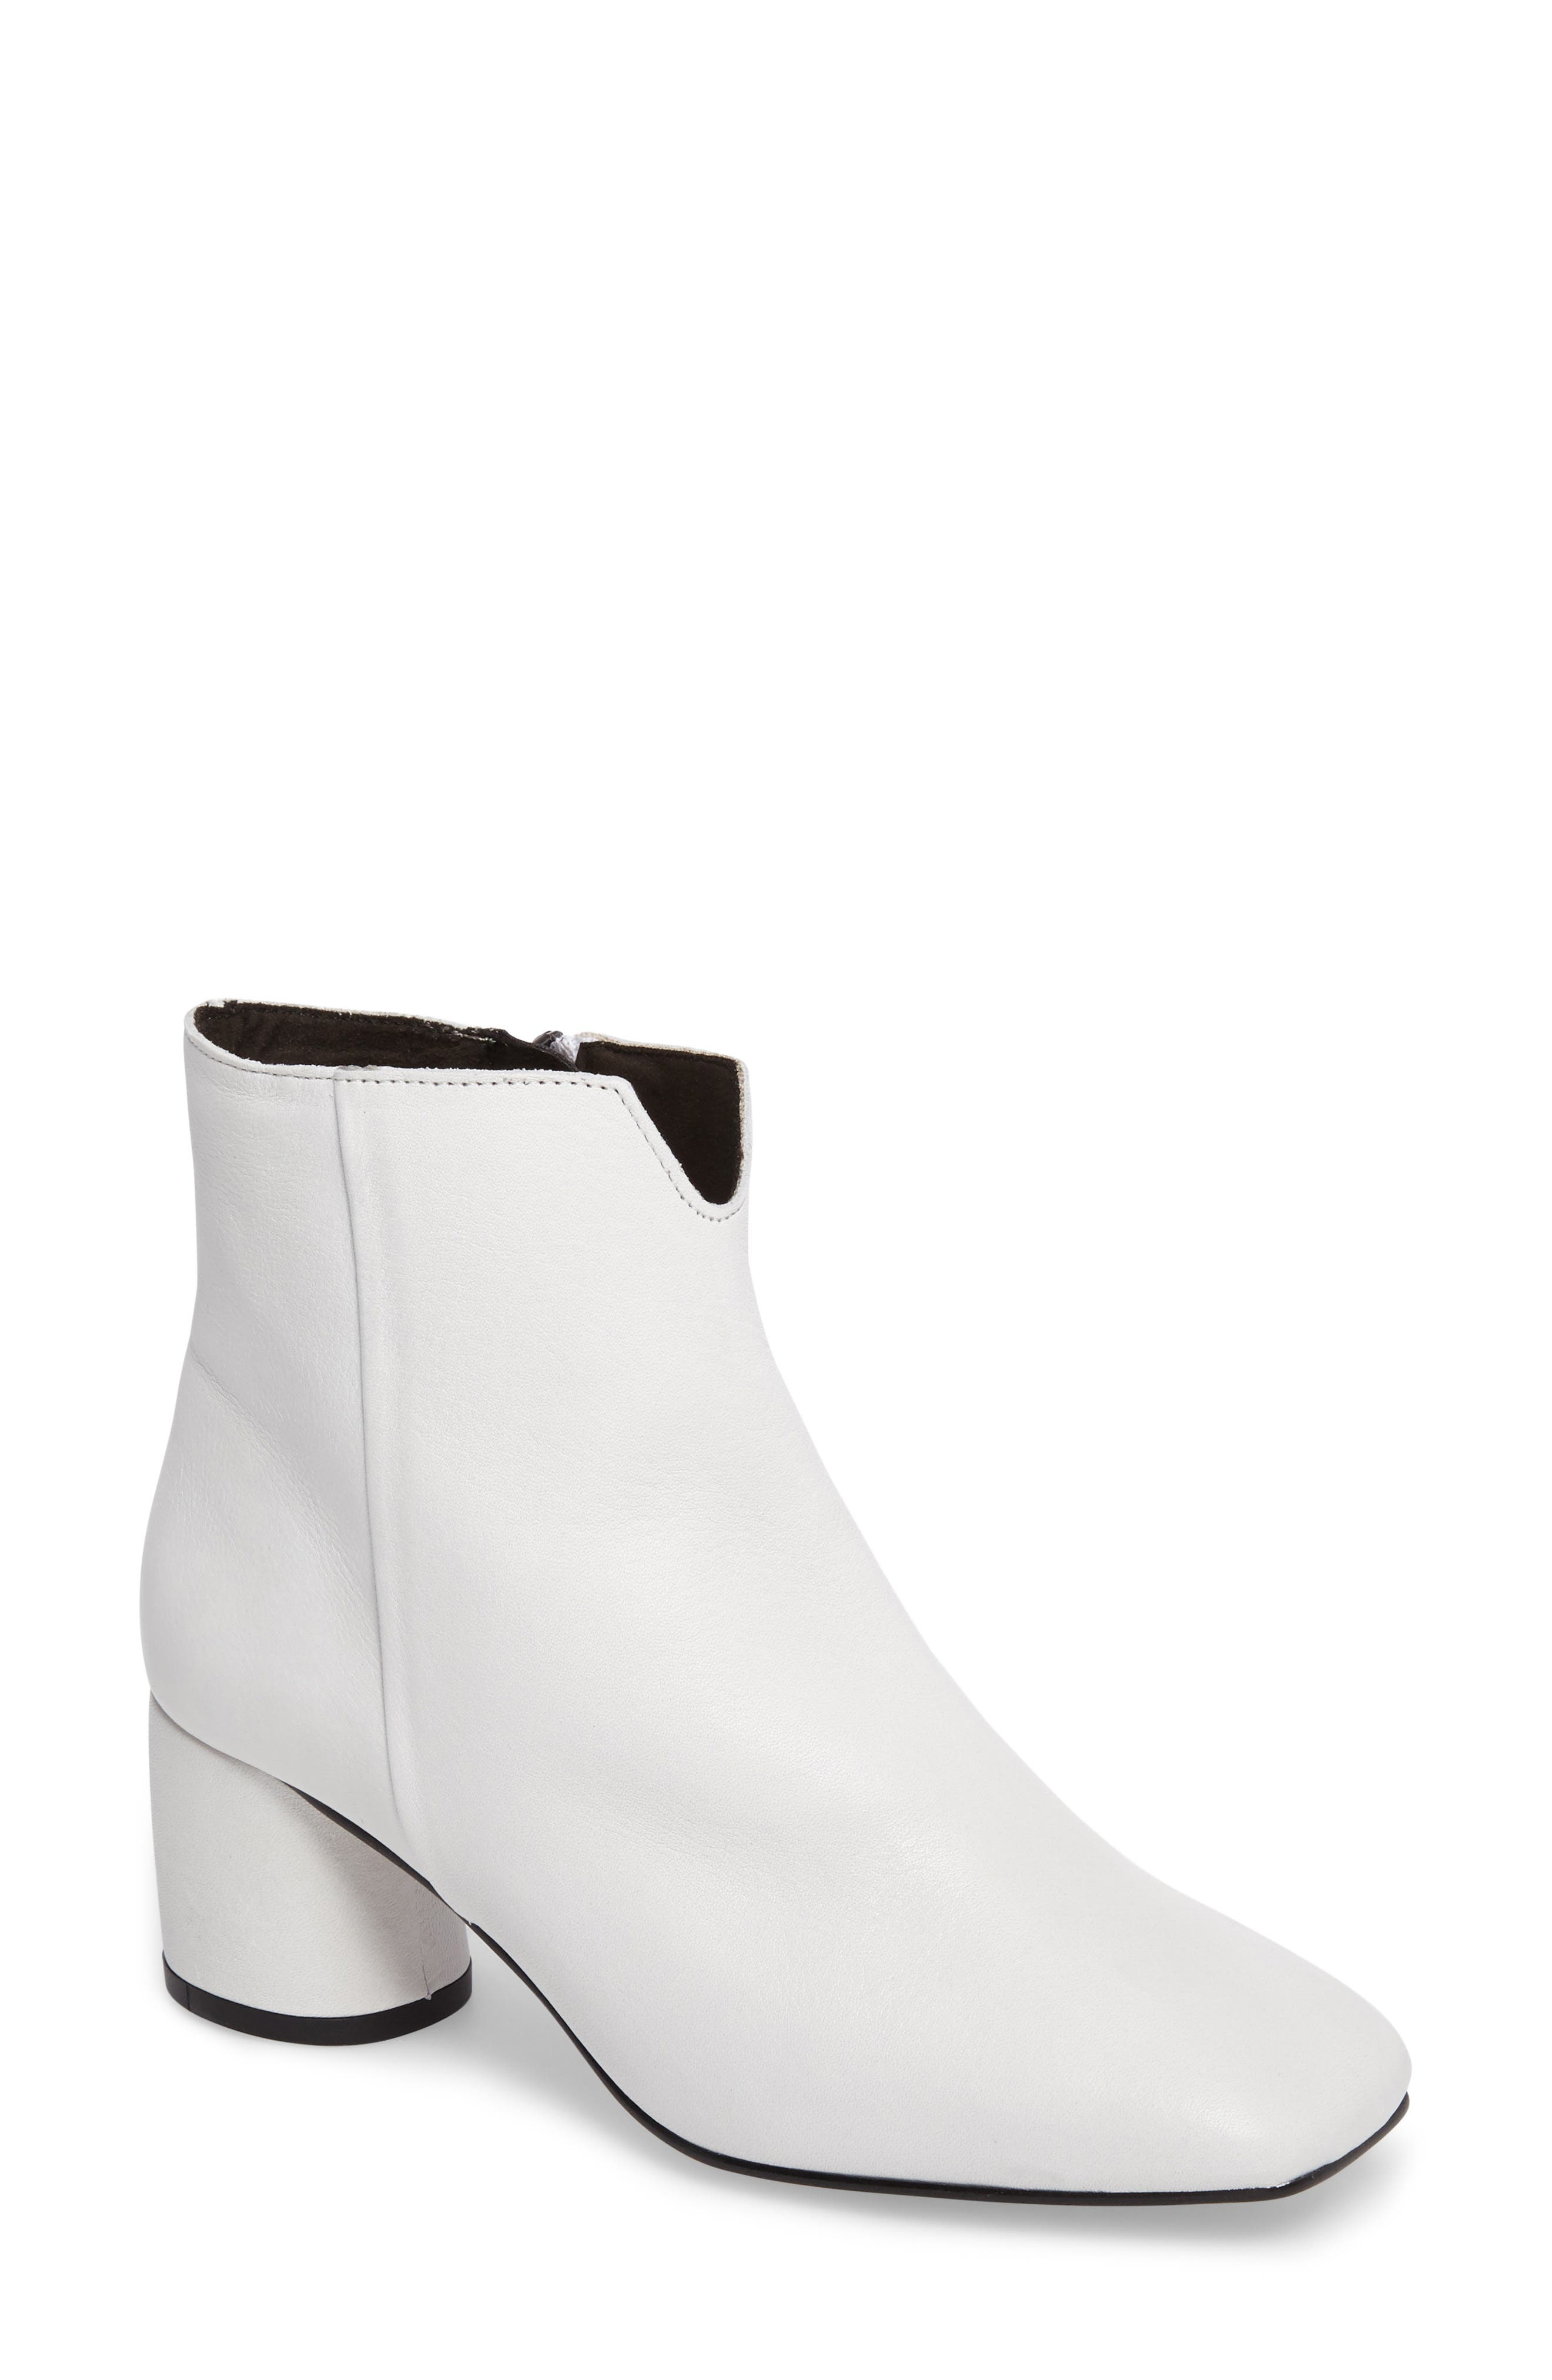 Marilo Block Heel Bootie,                         Main,                         color, White